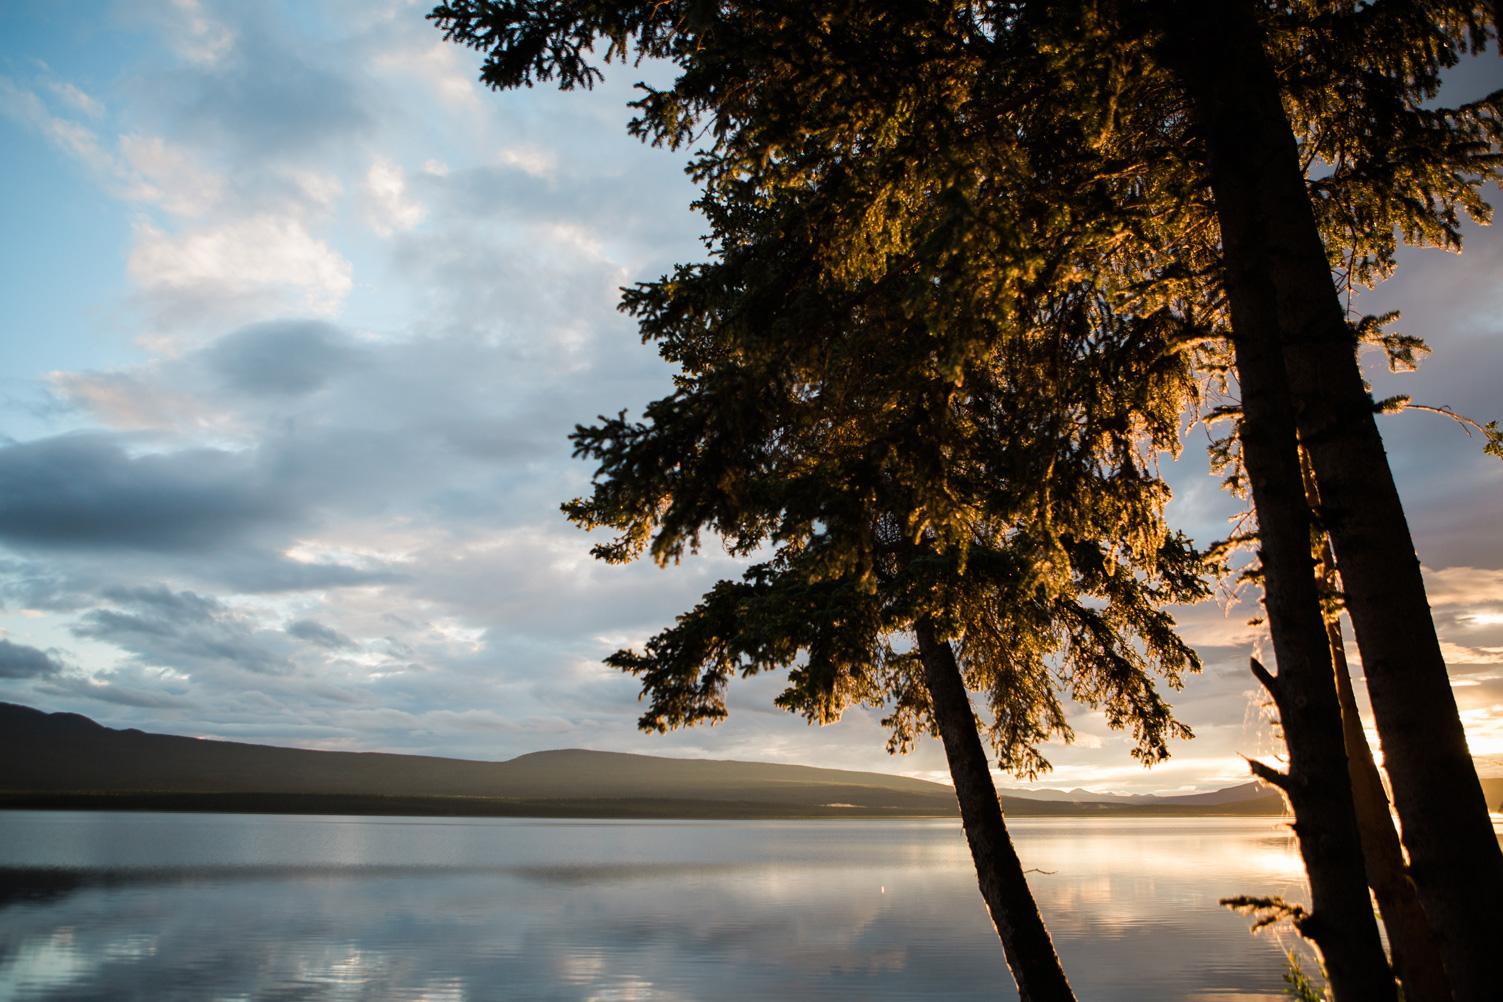 CindyGiovagnoli_BritishColumbia_Yukon_Alaska_roadtrip_AlCan_Alaskan_Highway_truck_camping-020.jpg